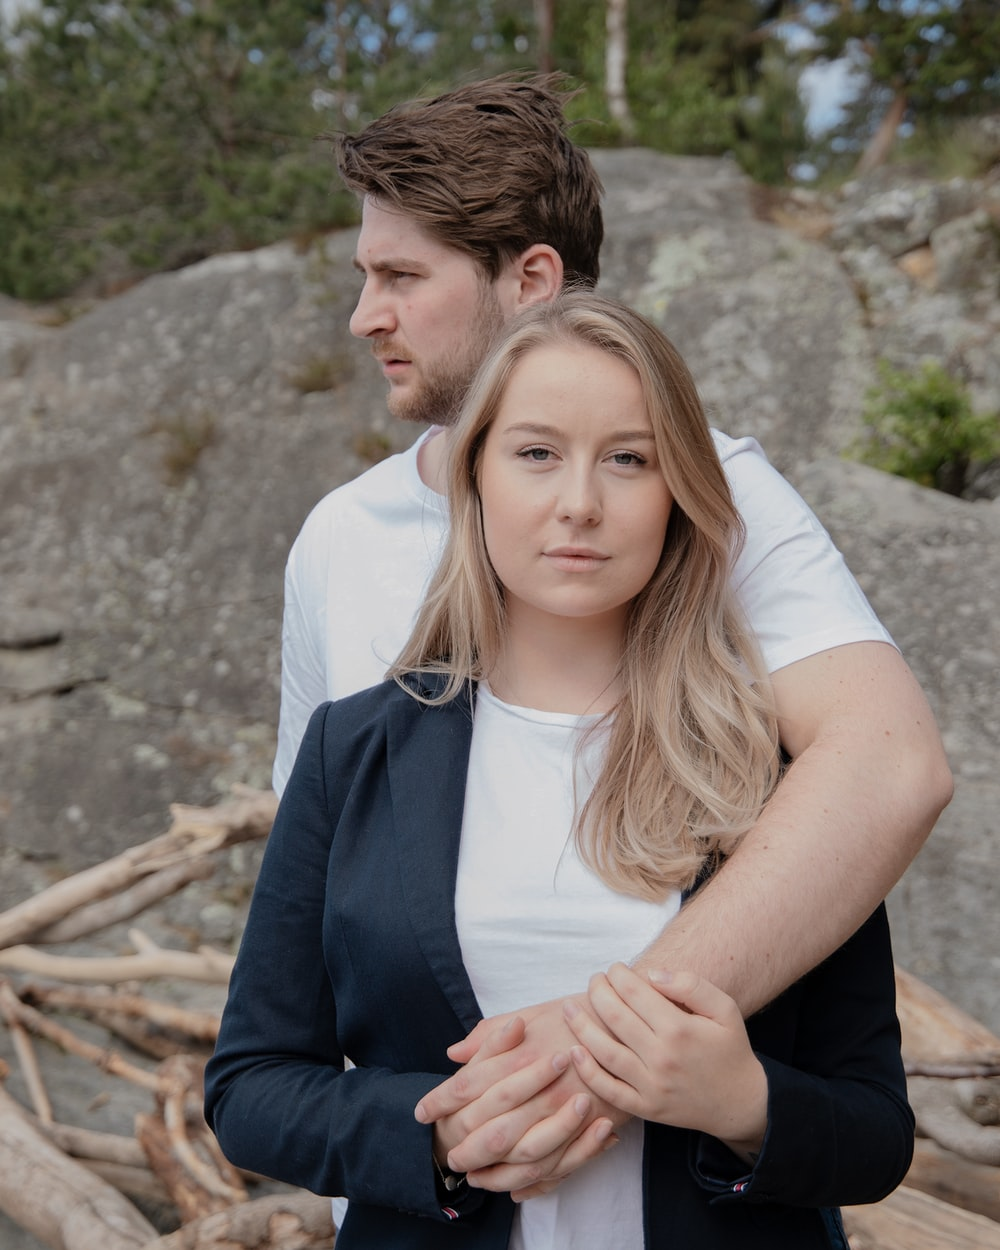 man in black suit hugging woman in white sleeveless dress